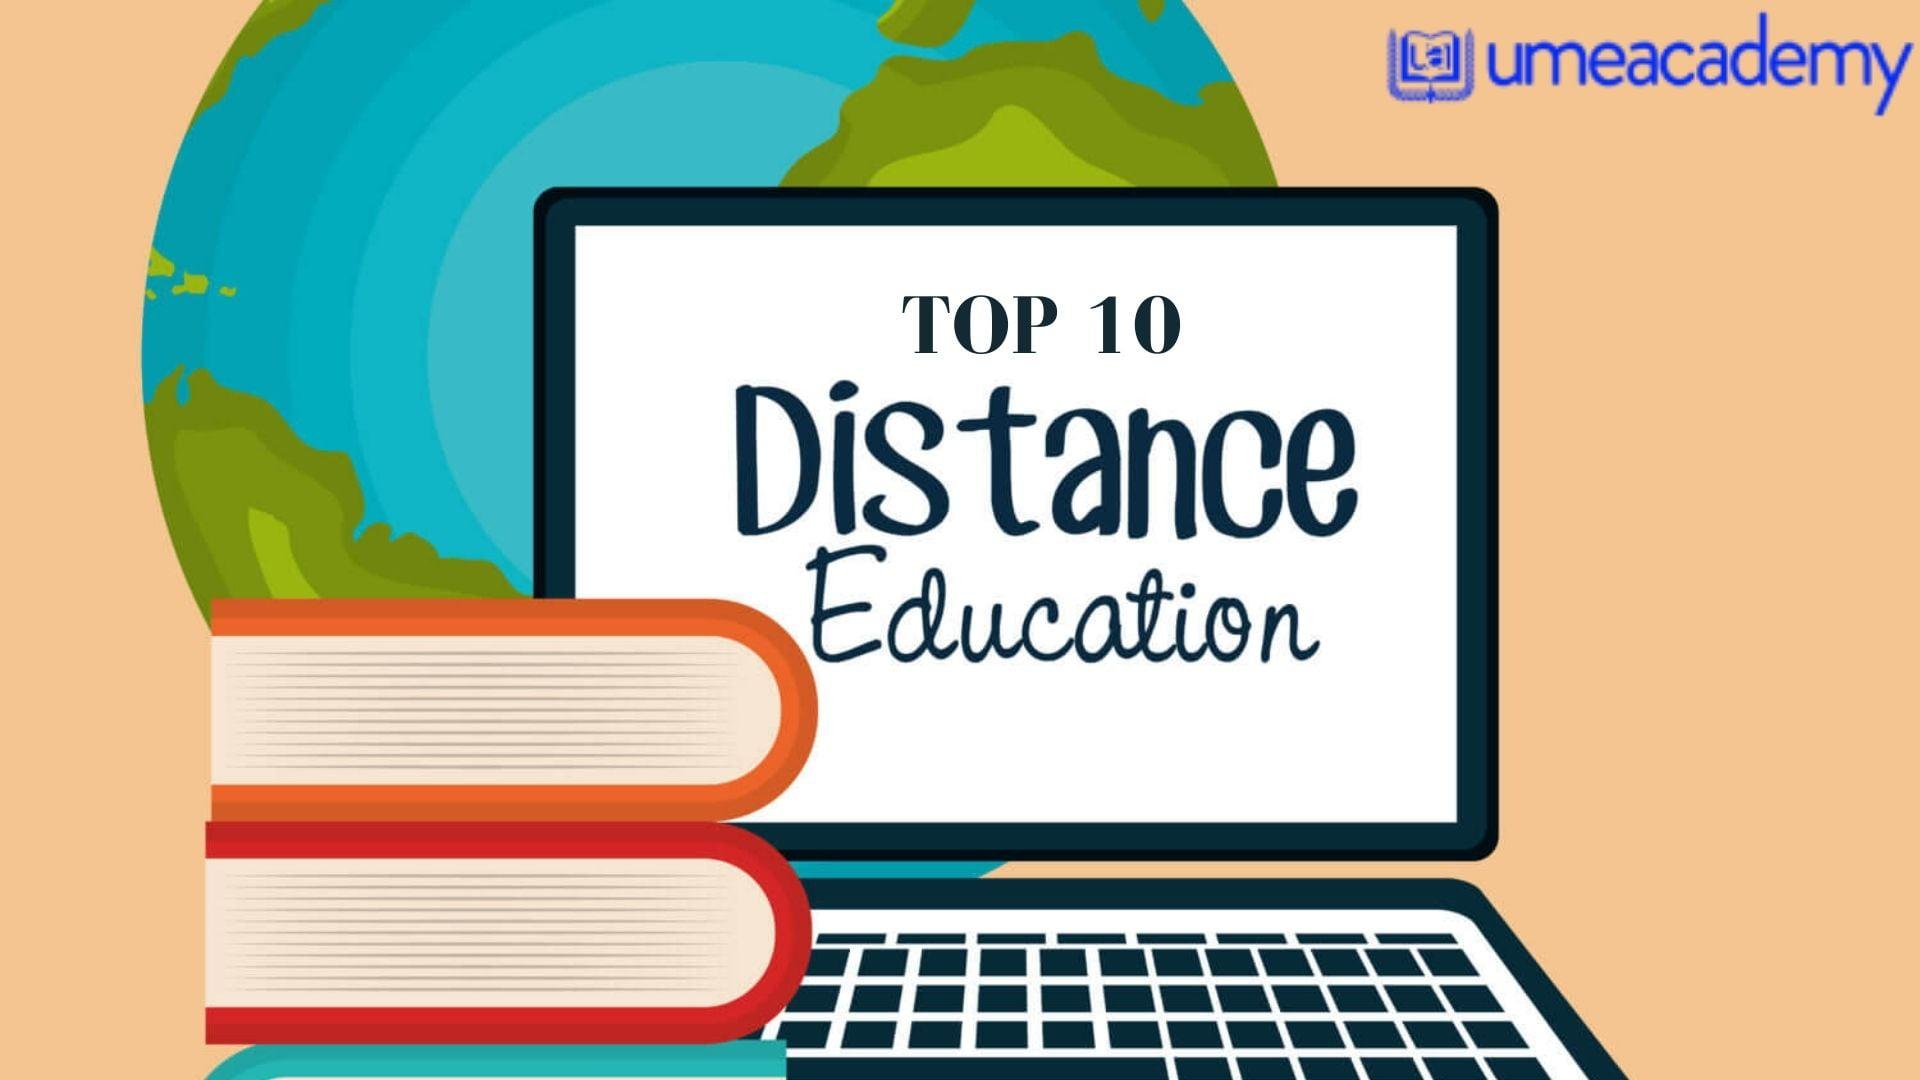 Top 10 distance education